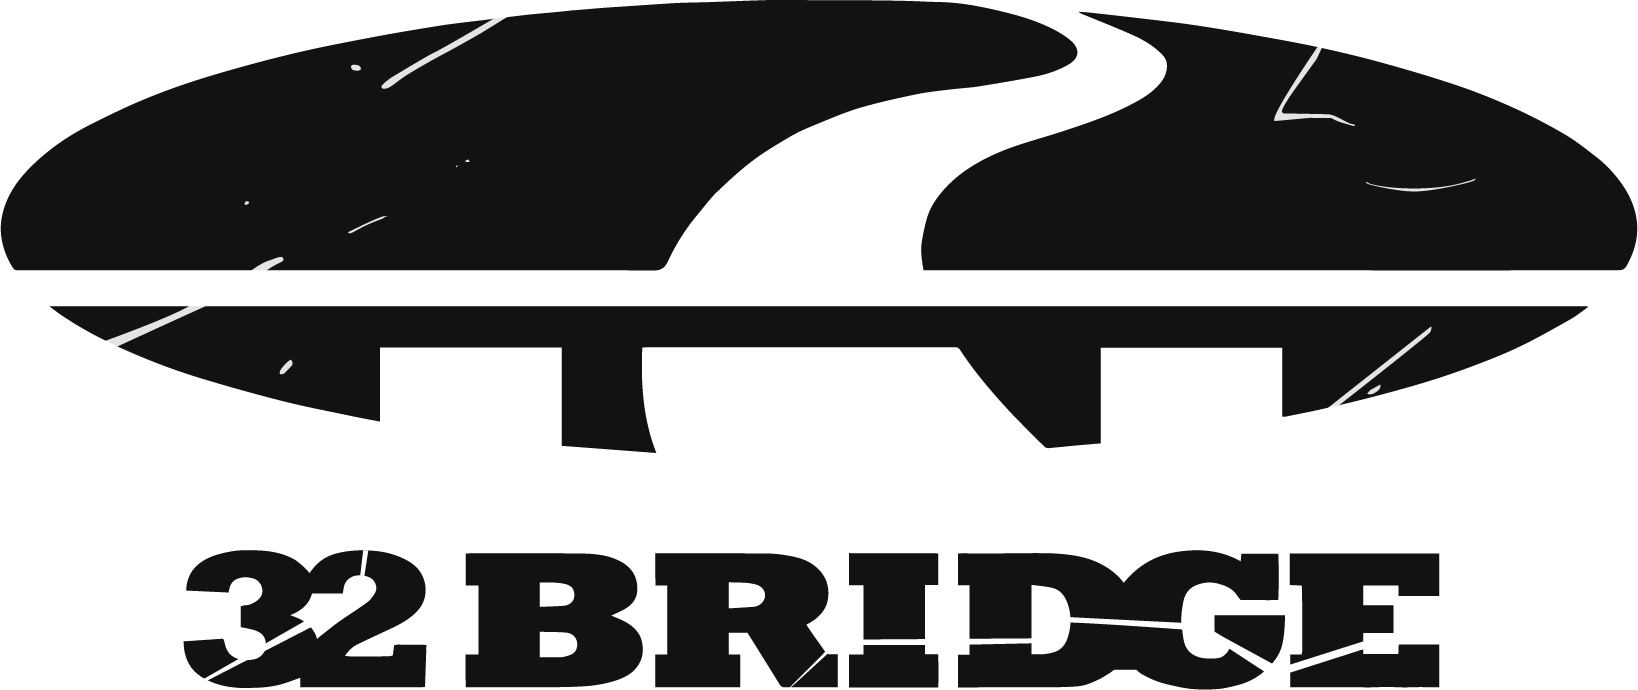 32 Bridge Symbol near Black textured